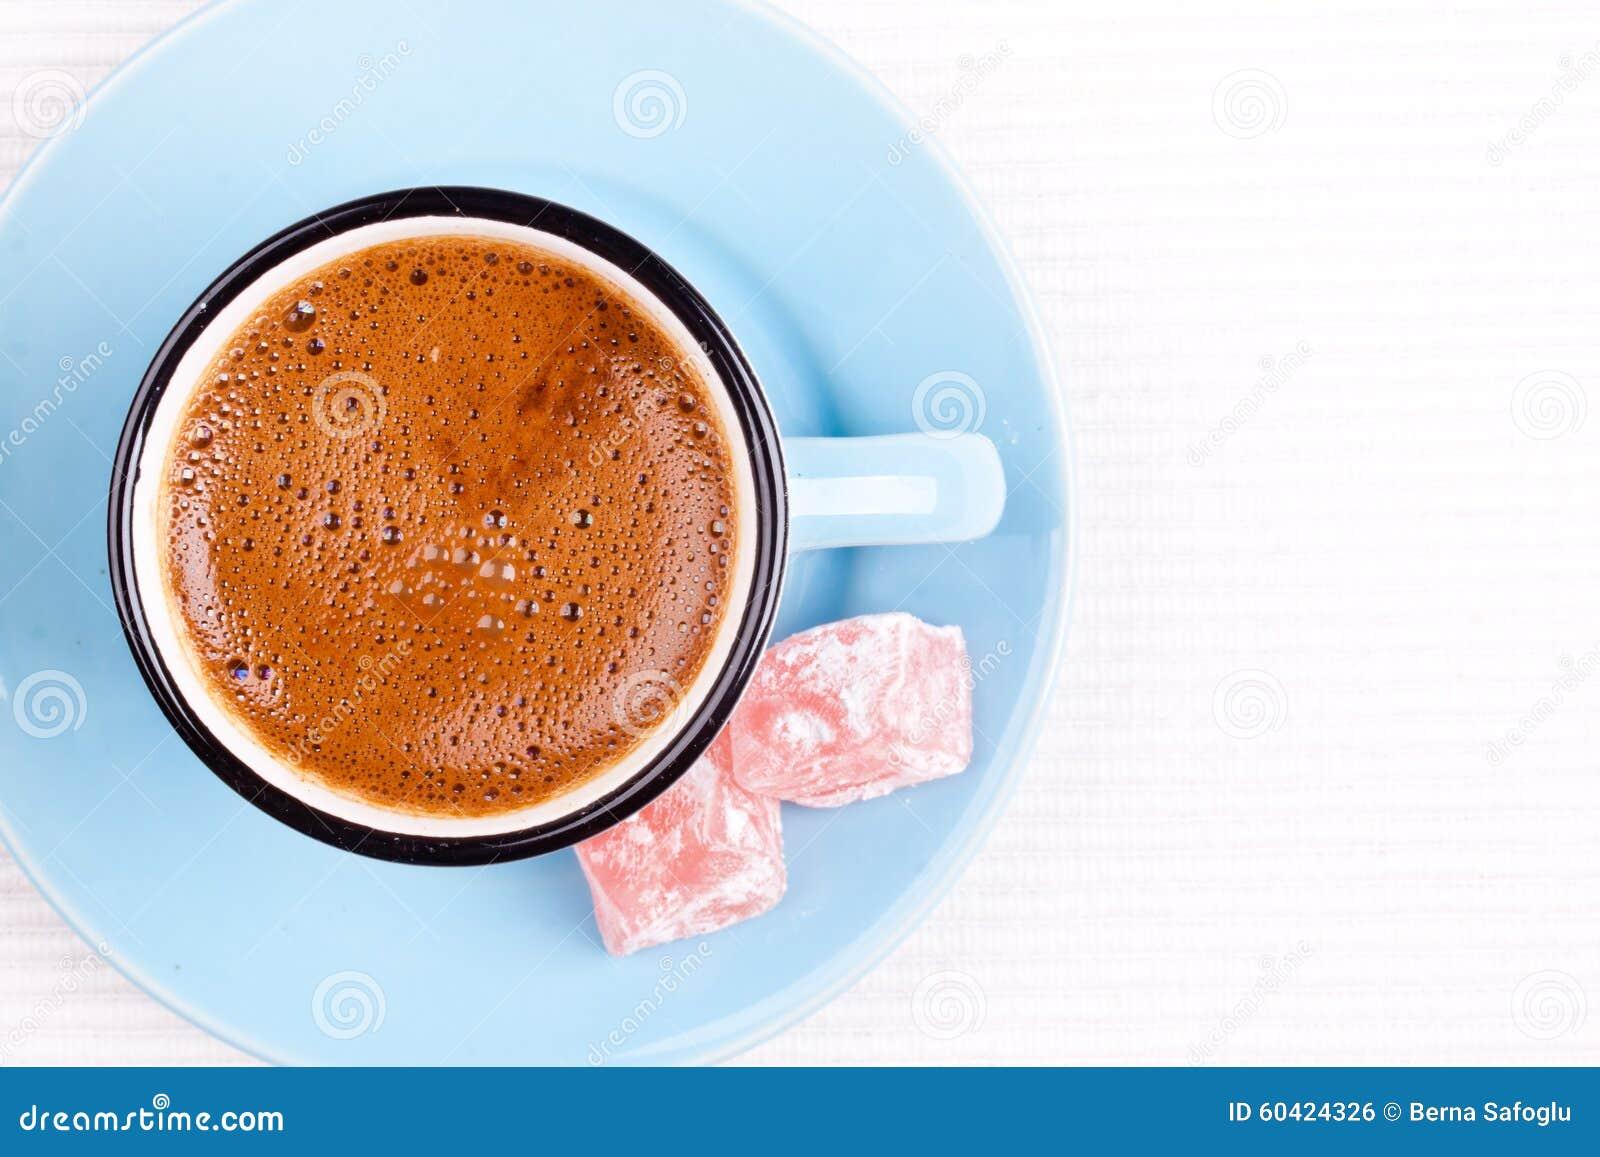 土耳其咖啡和delighr